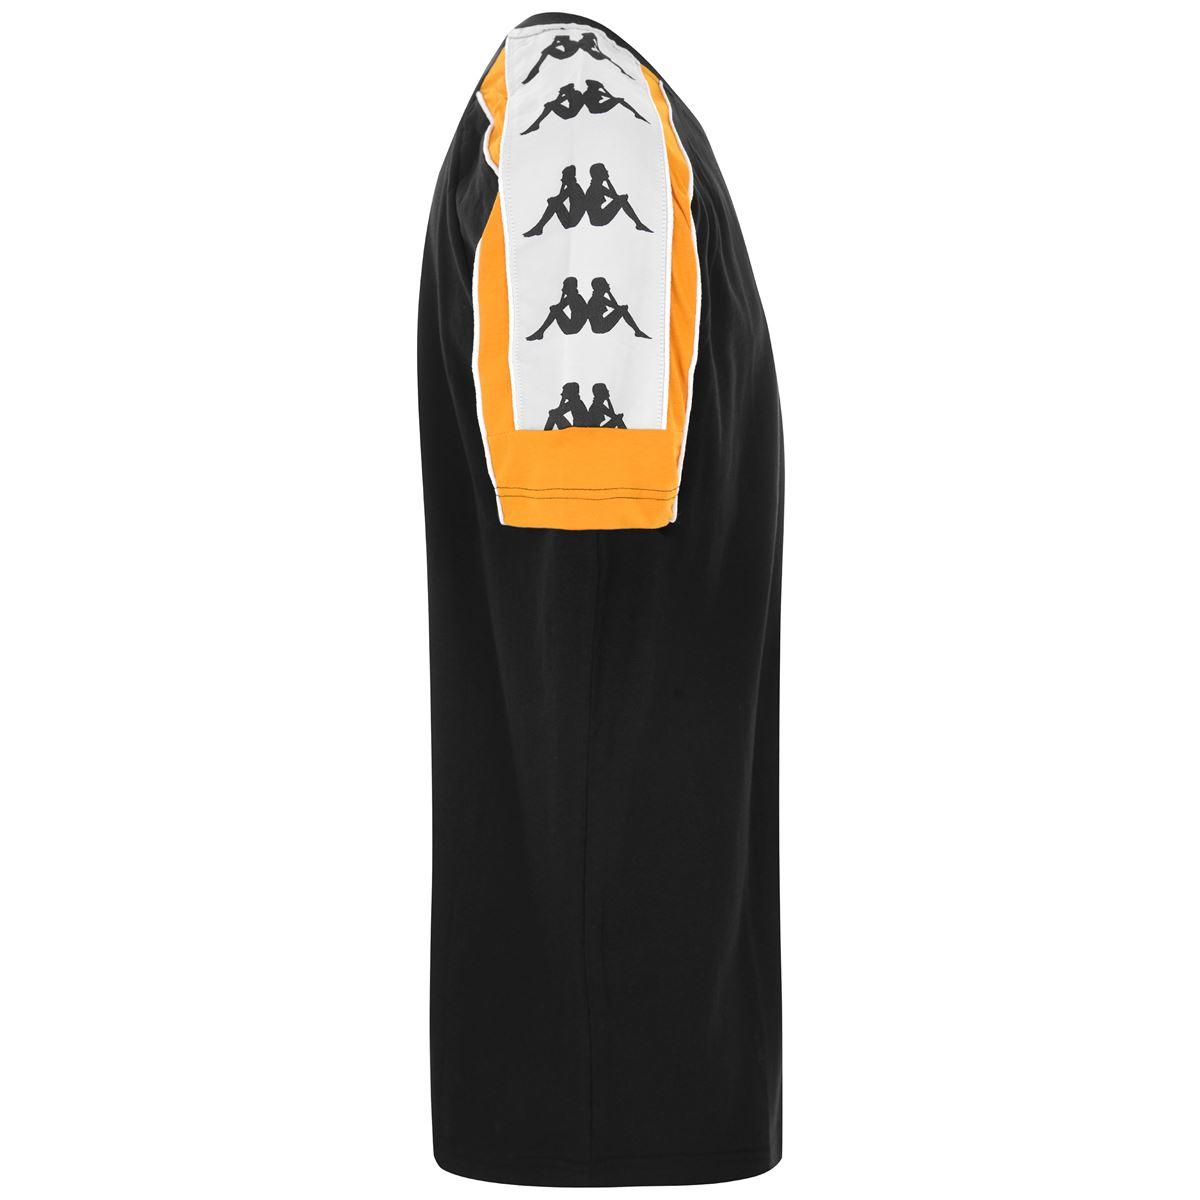 T-Shirt unisex girocollo in jersey Kappa | T-shirt | 304I050CA0 BLACK-OCHRE-WHITE